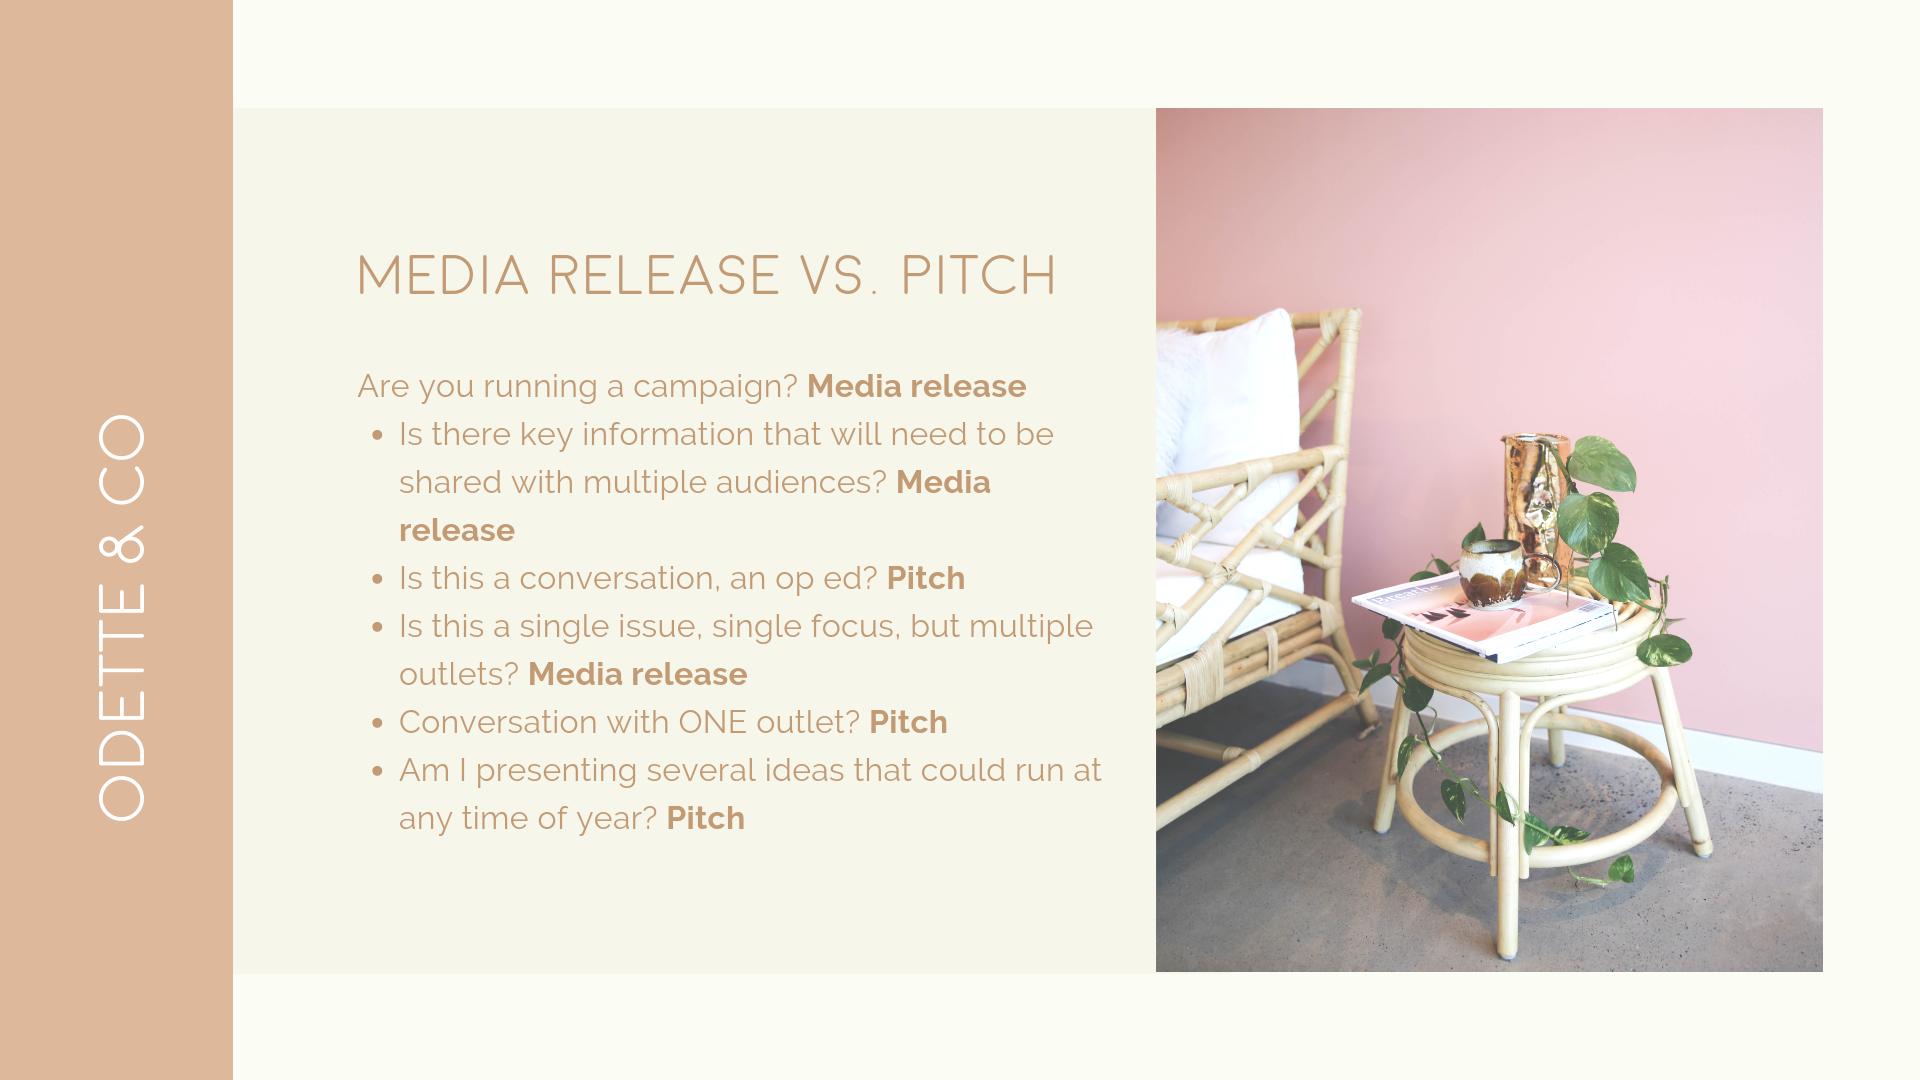 MEDIA RELEASE VS PITCH